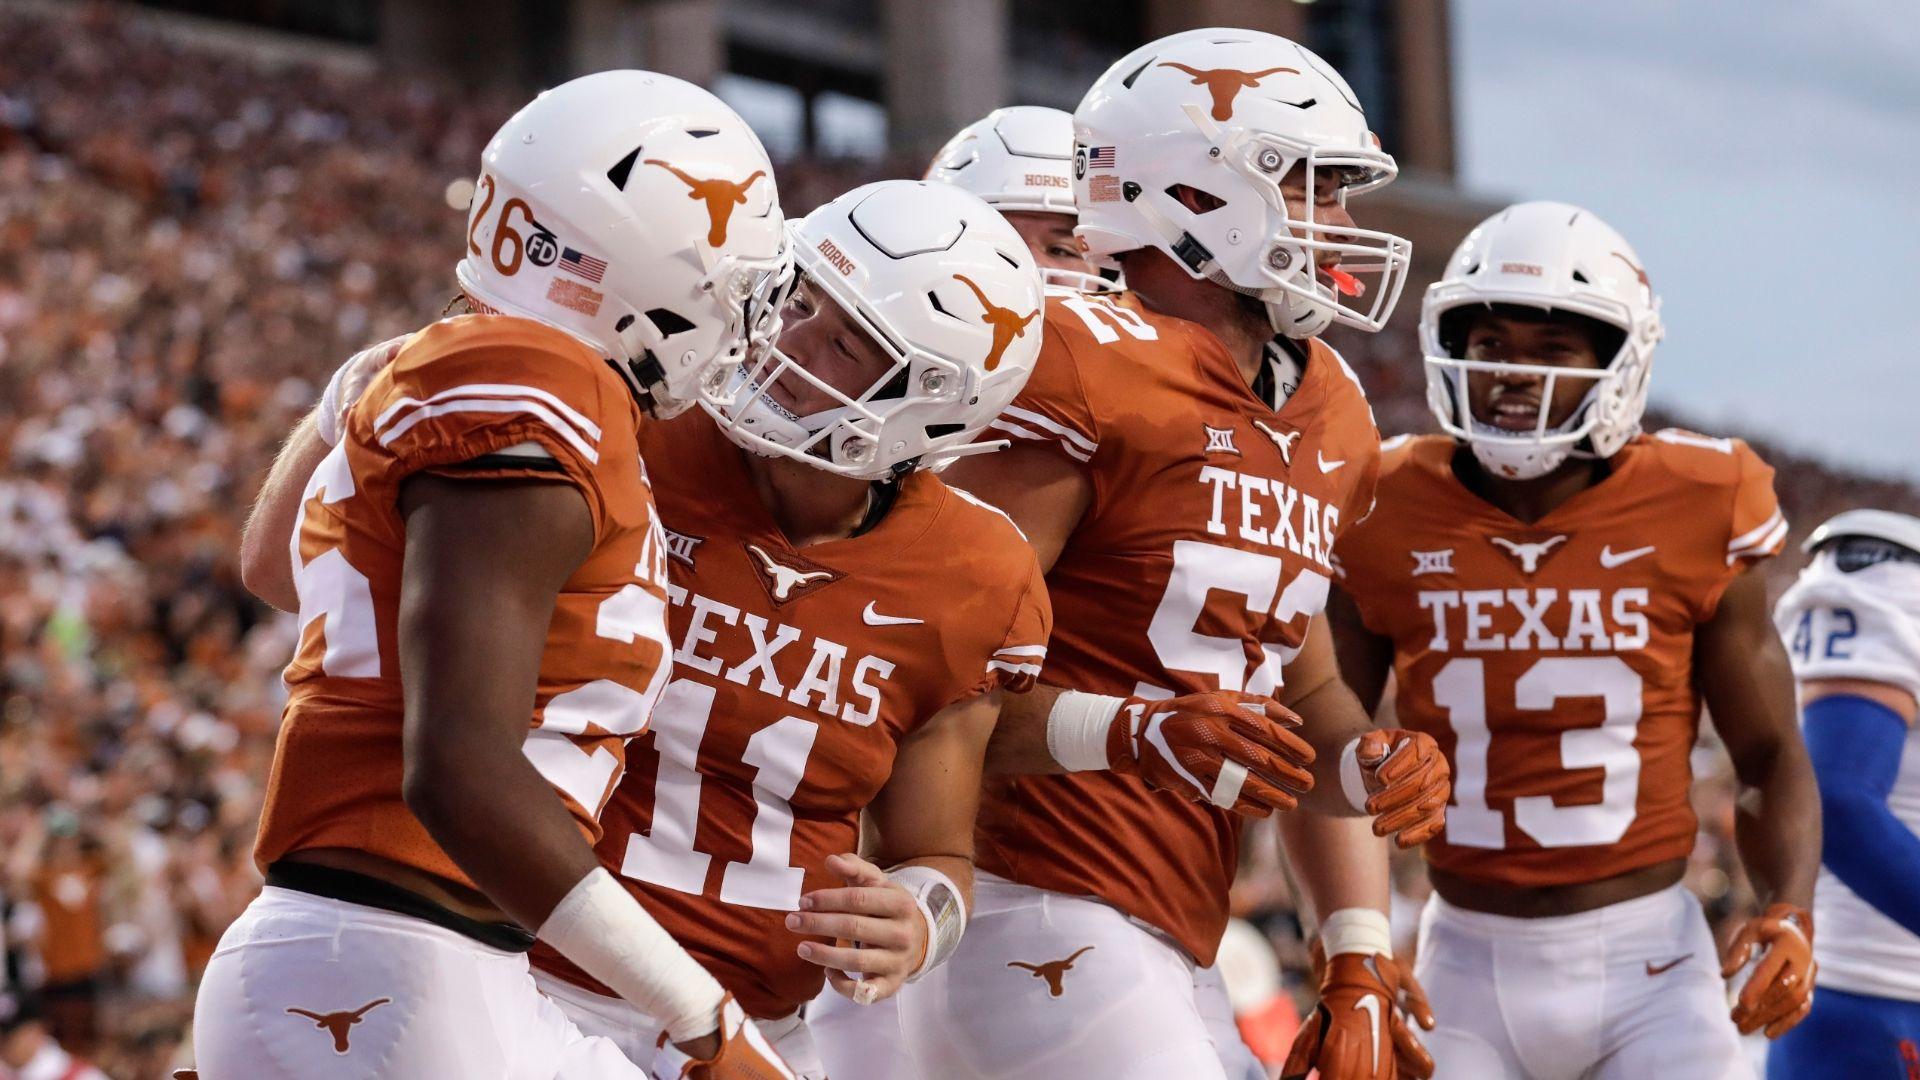 Texas look to reclaim Lone Star State against TCU